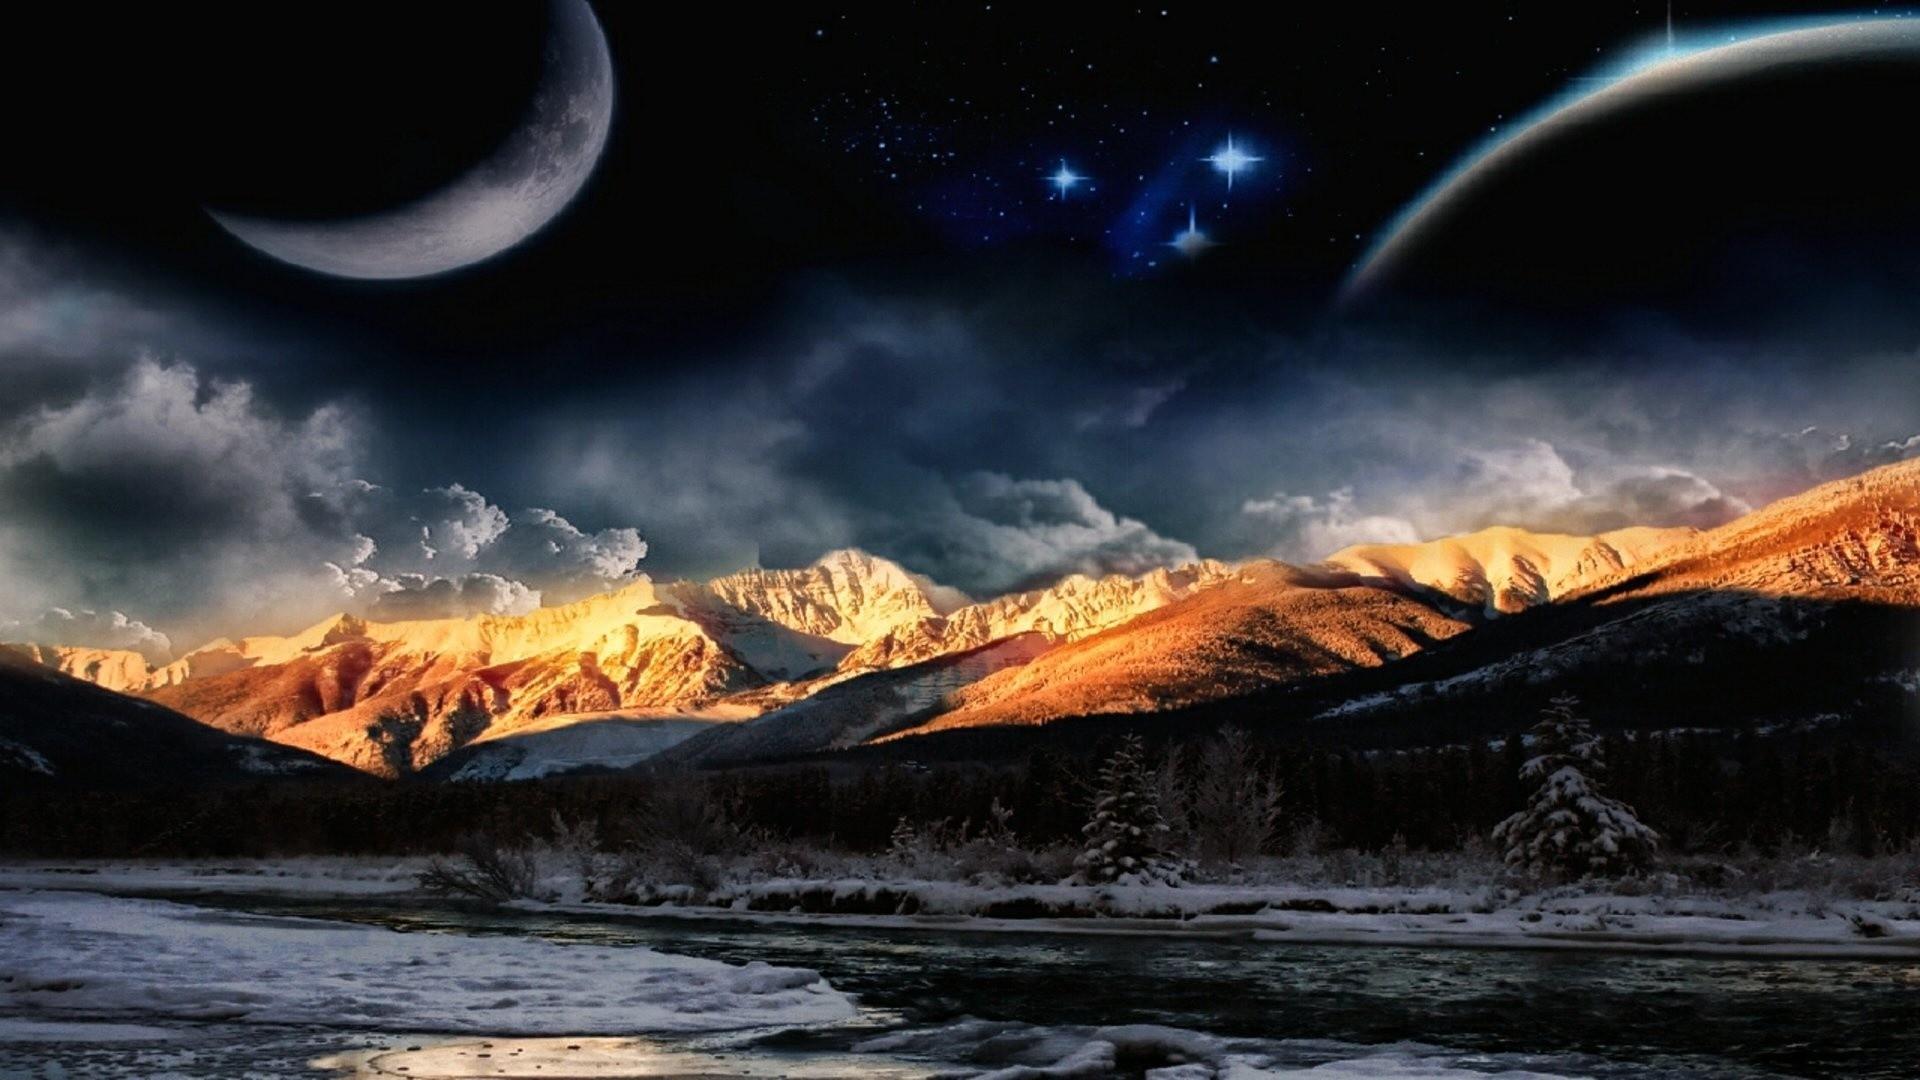 Night Mountain Wallpaper Fantasy